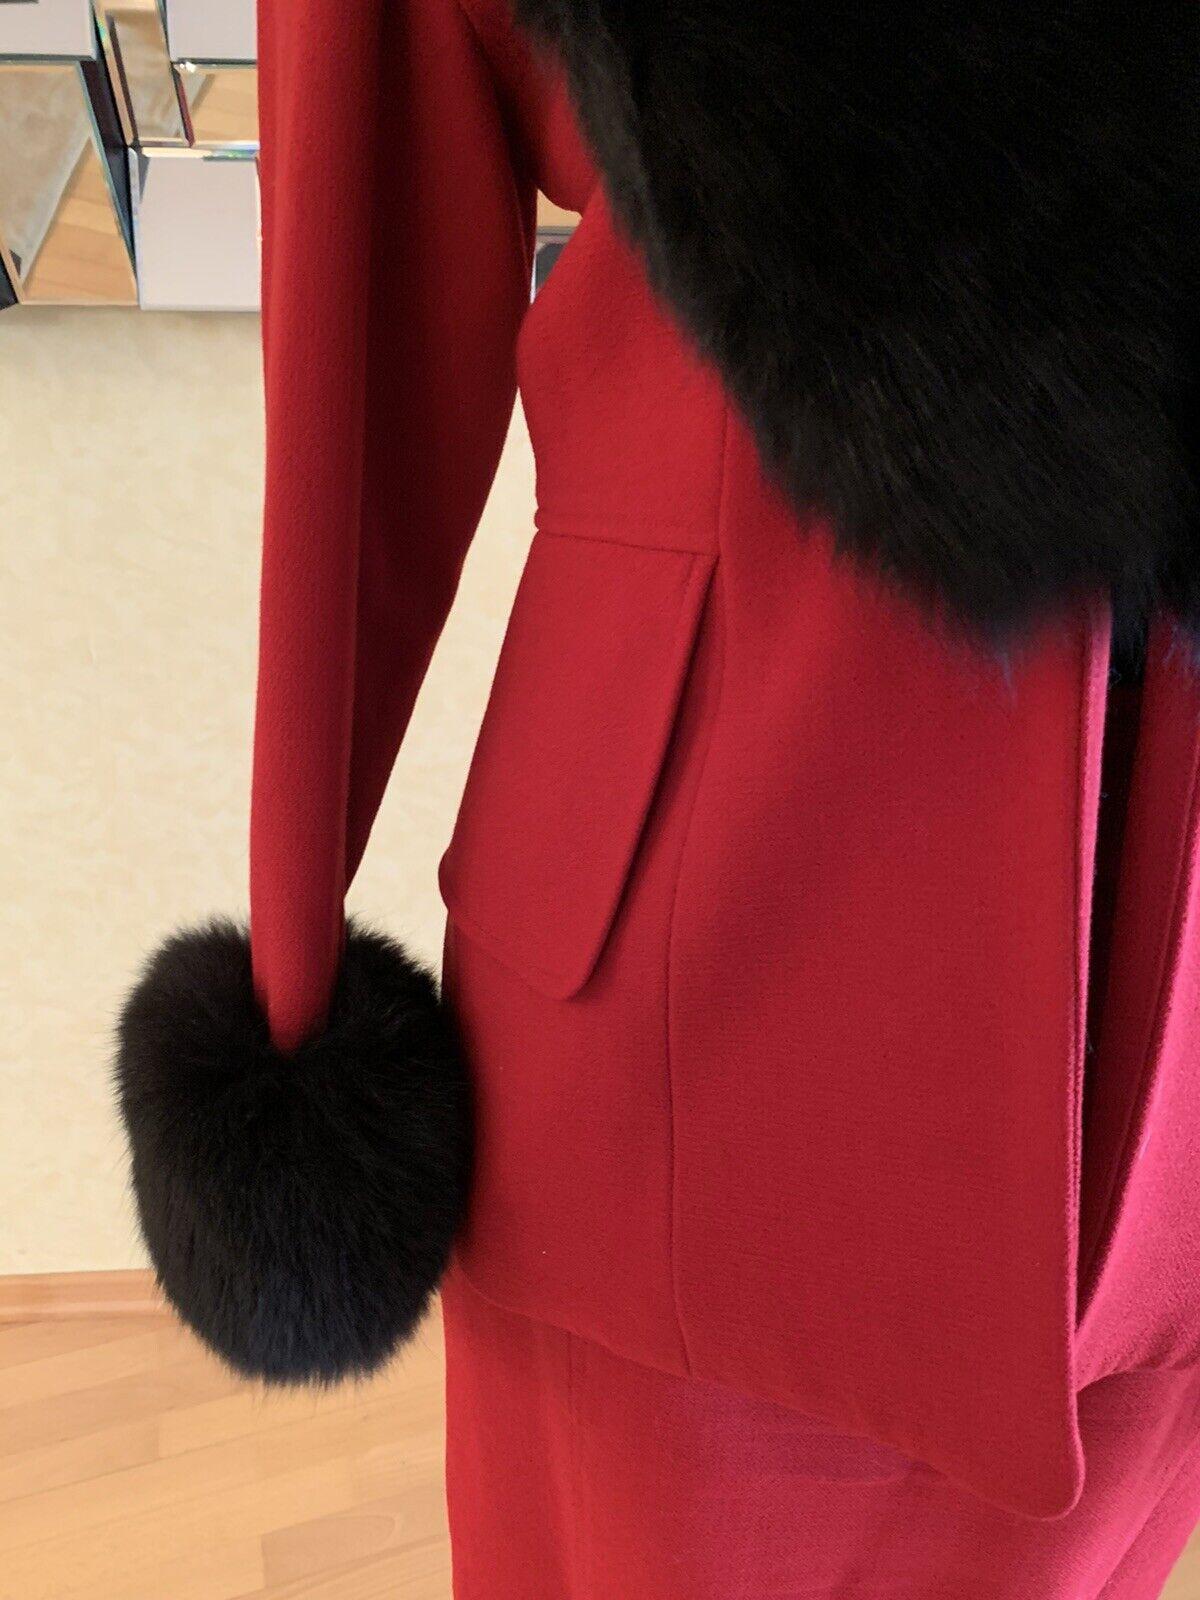 Zang Toi Star Designer Kostüm US 6 D36 rot Fell einzigartig Sammlerstück Vintage